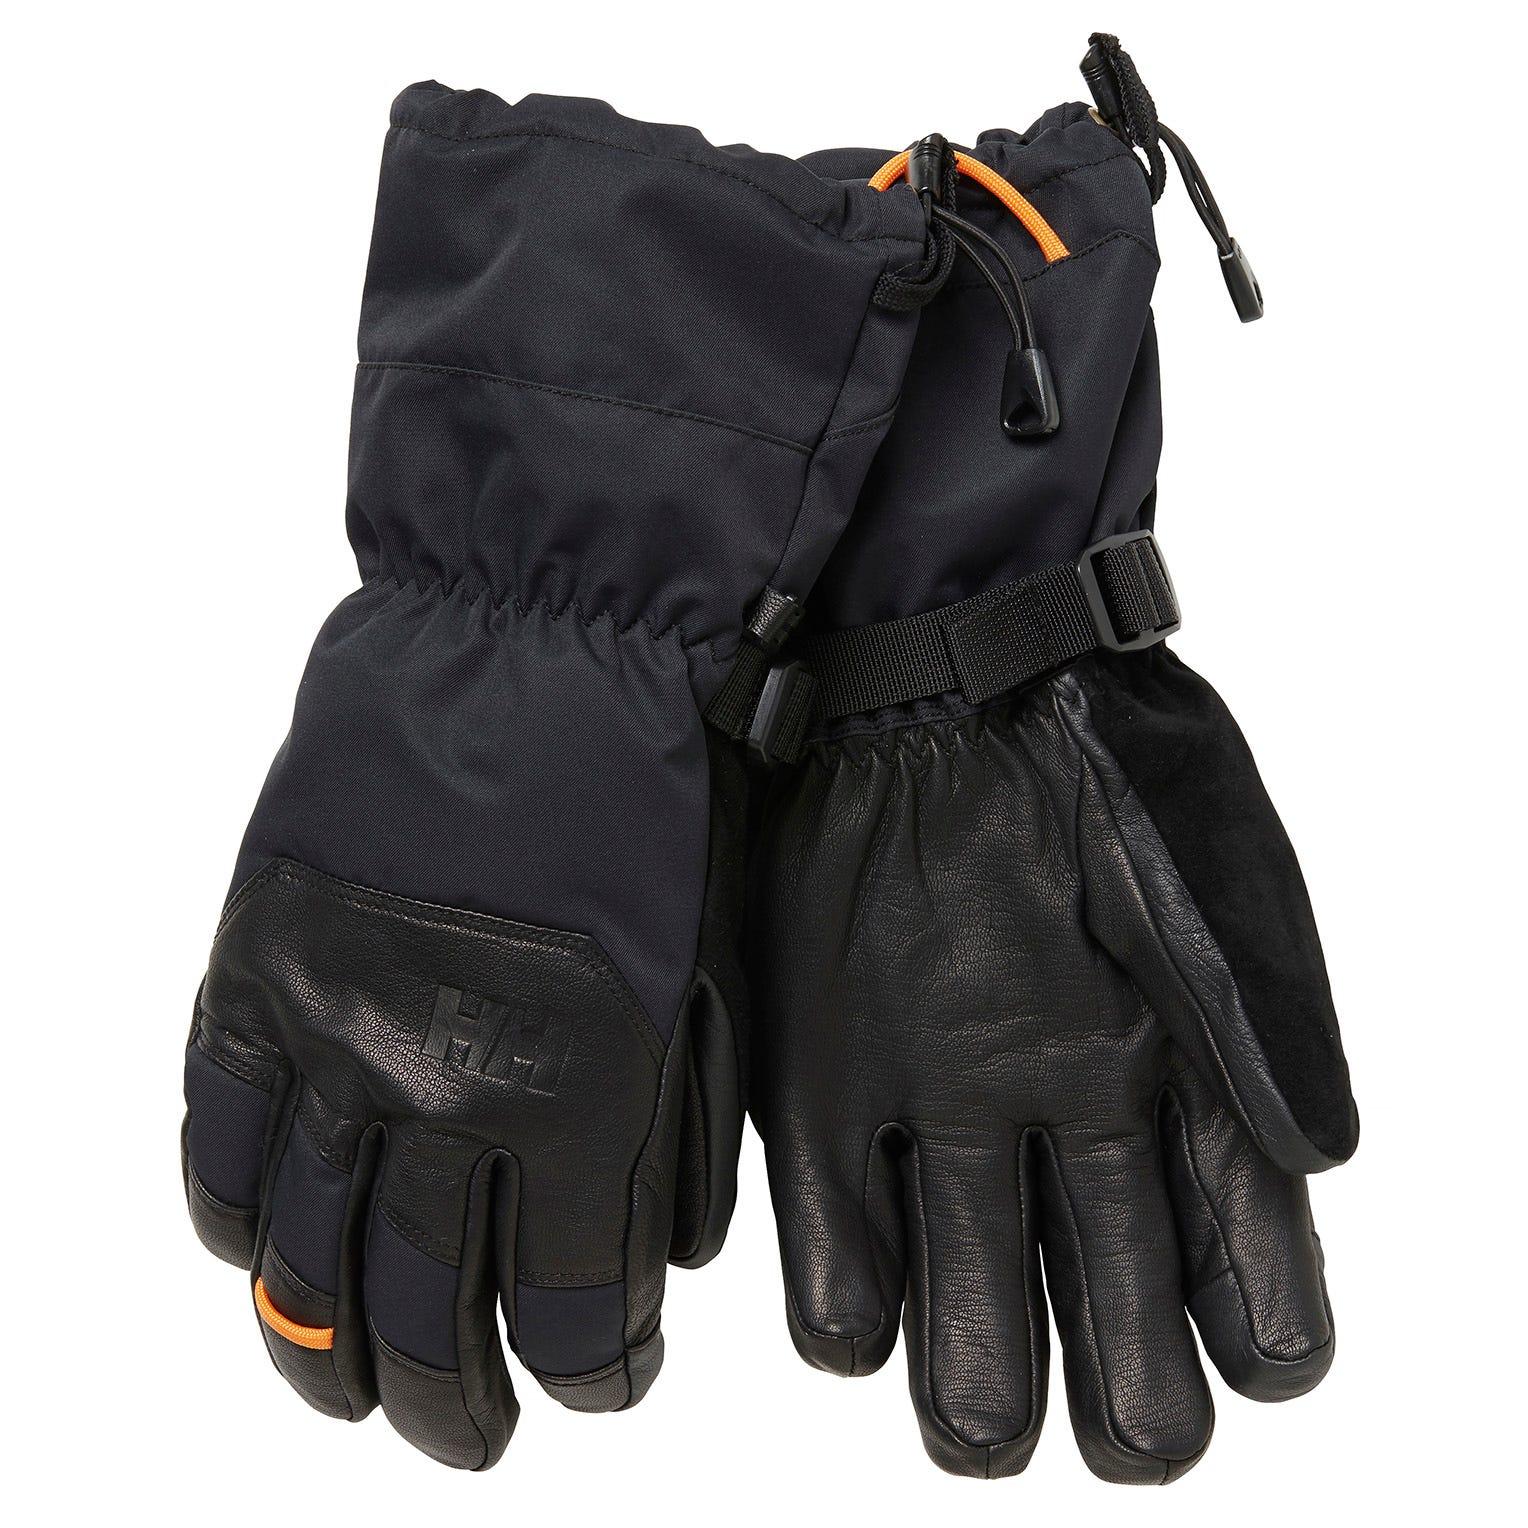 Helly Hansen Ullr Sogn Ht Glove Mens Black L